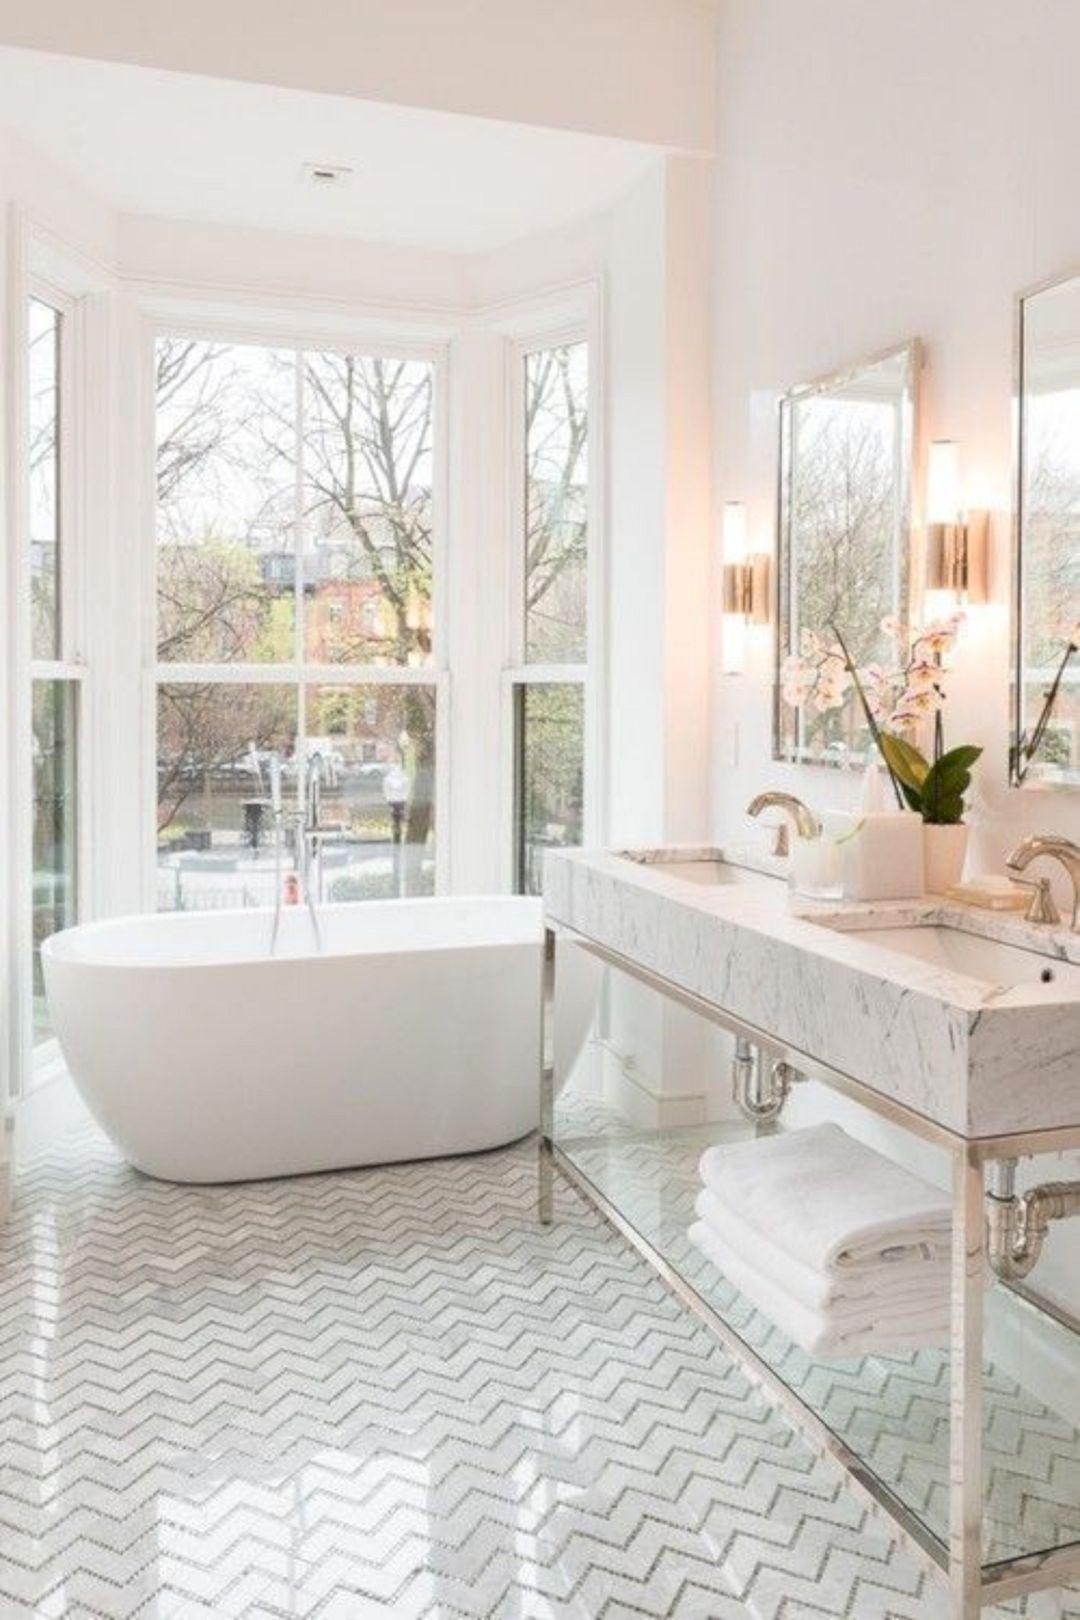 15 Elegant Bathroom Ideas To Steal 12 | Ideen Bad | Pinterest | DIY ...